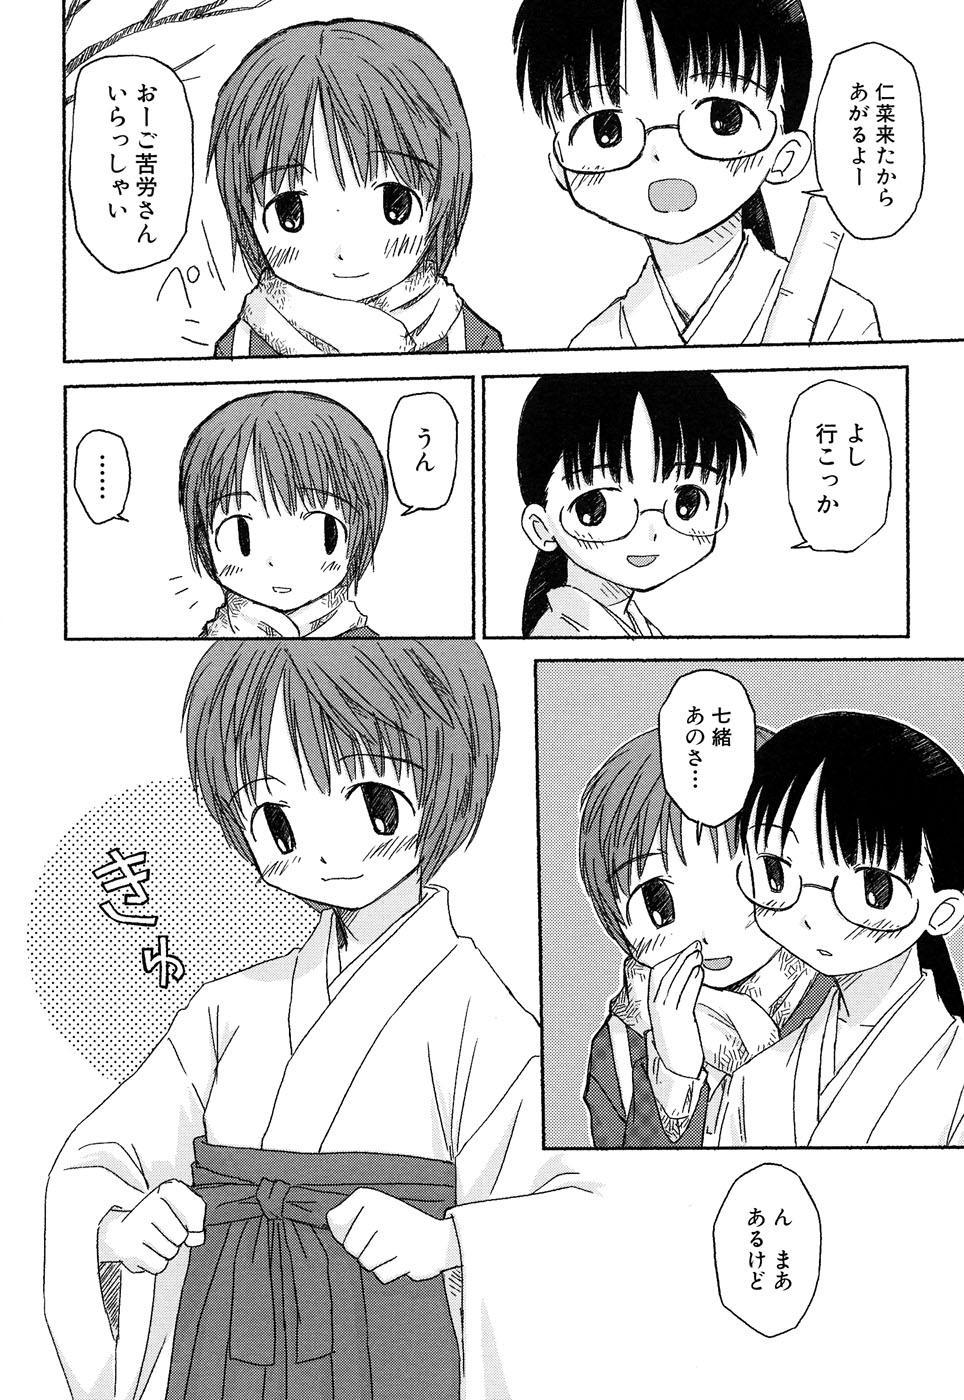 Fechikko VS Series ROUND.2 Miko San VS Maid San 60